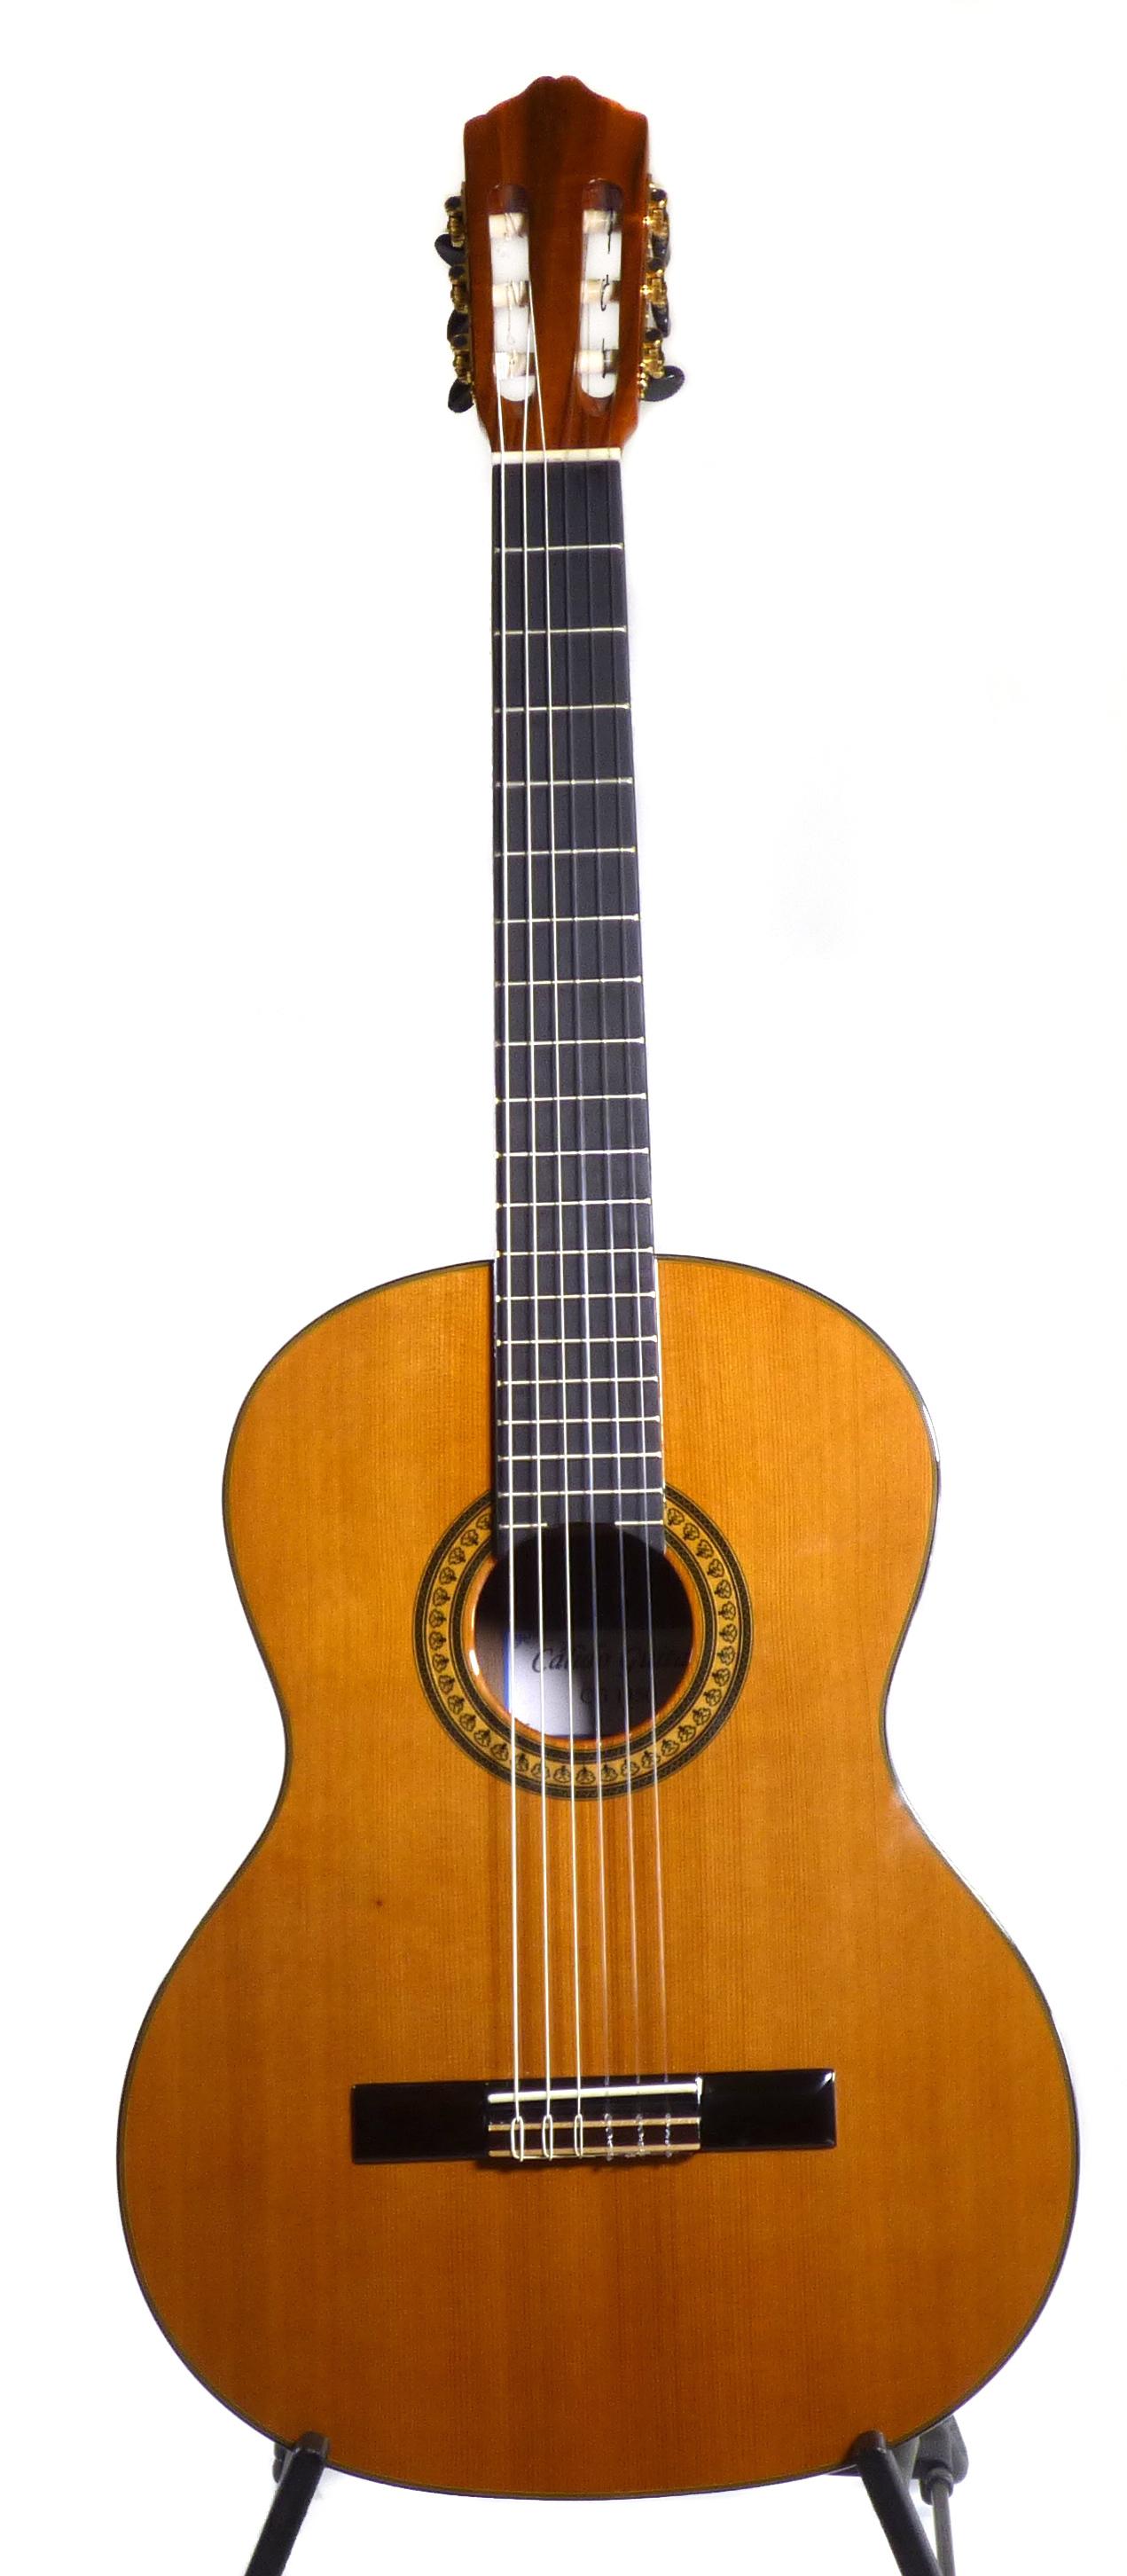 Calido CG 1450 - Classical Guitar - Solid Cedar top, Koa Back/Sides 00295